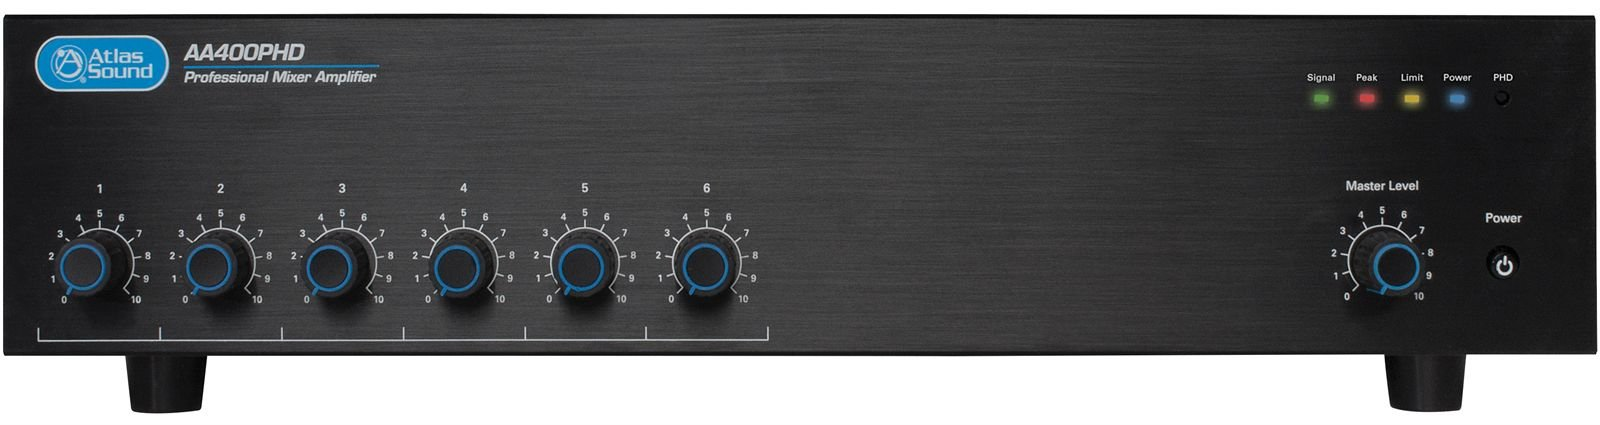 6-Channel Input, 400W Amplifier Mixer